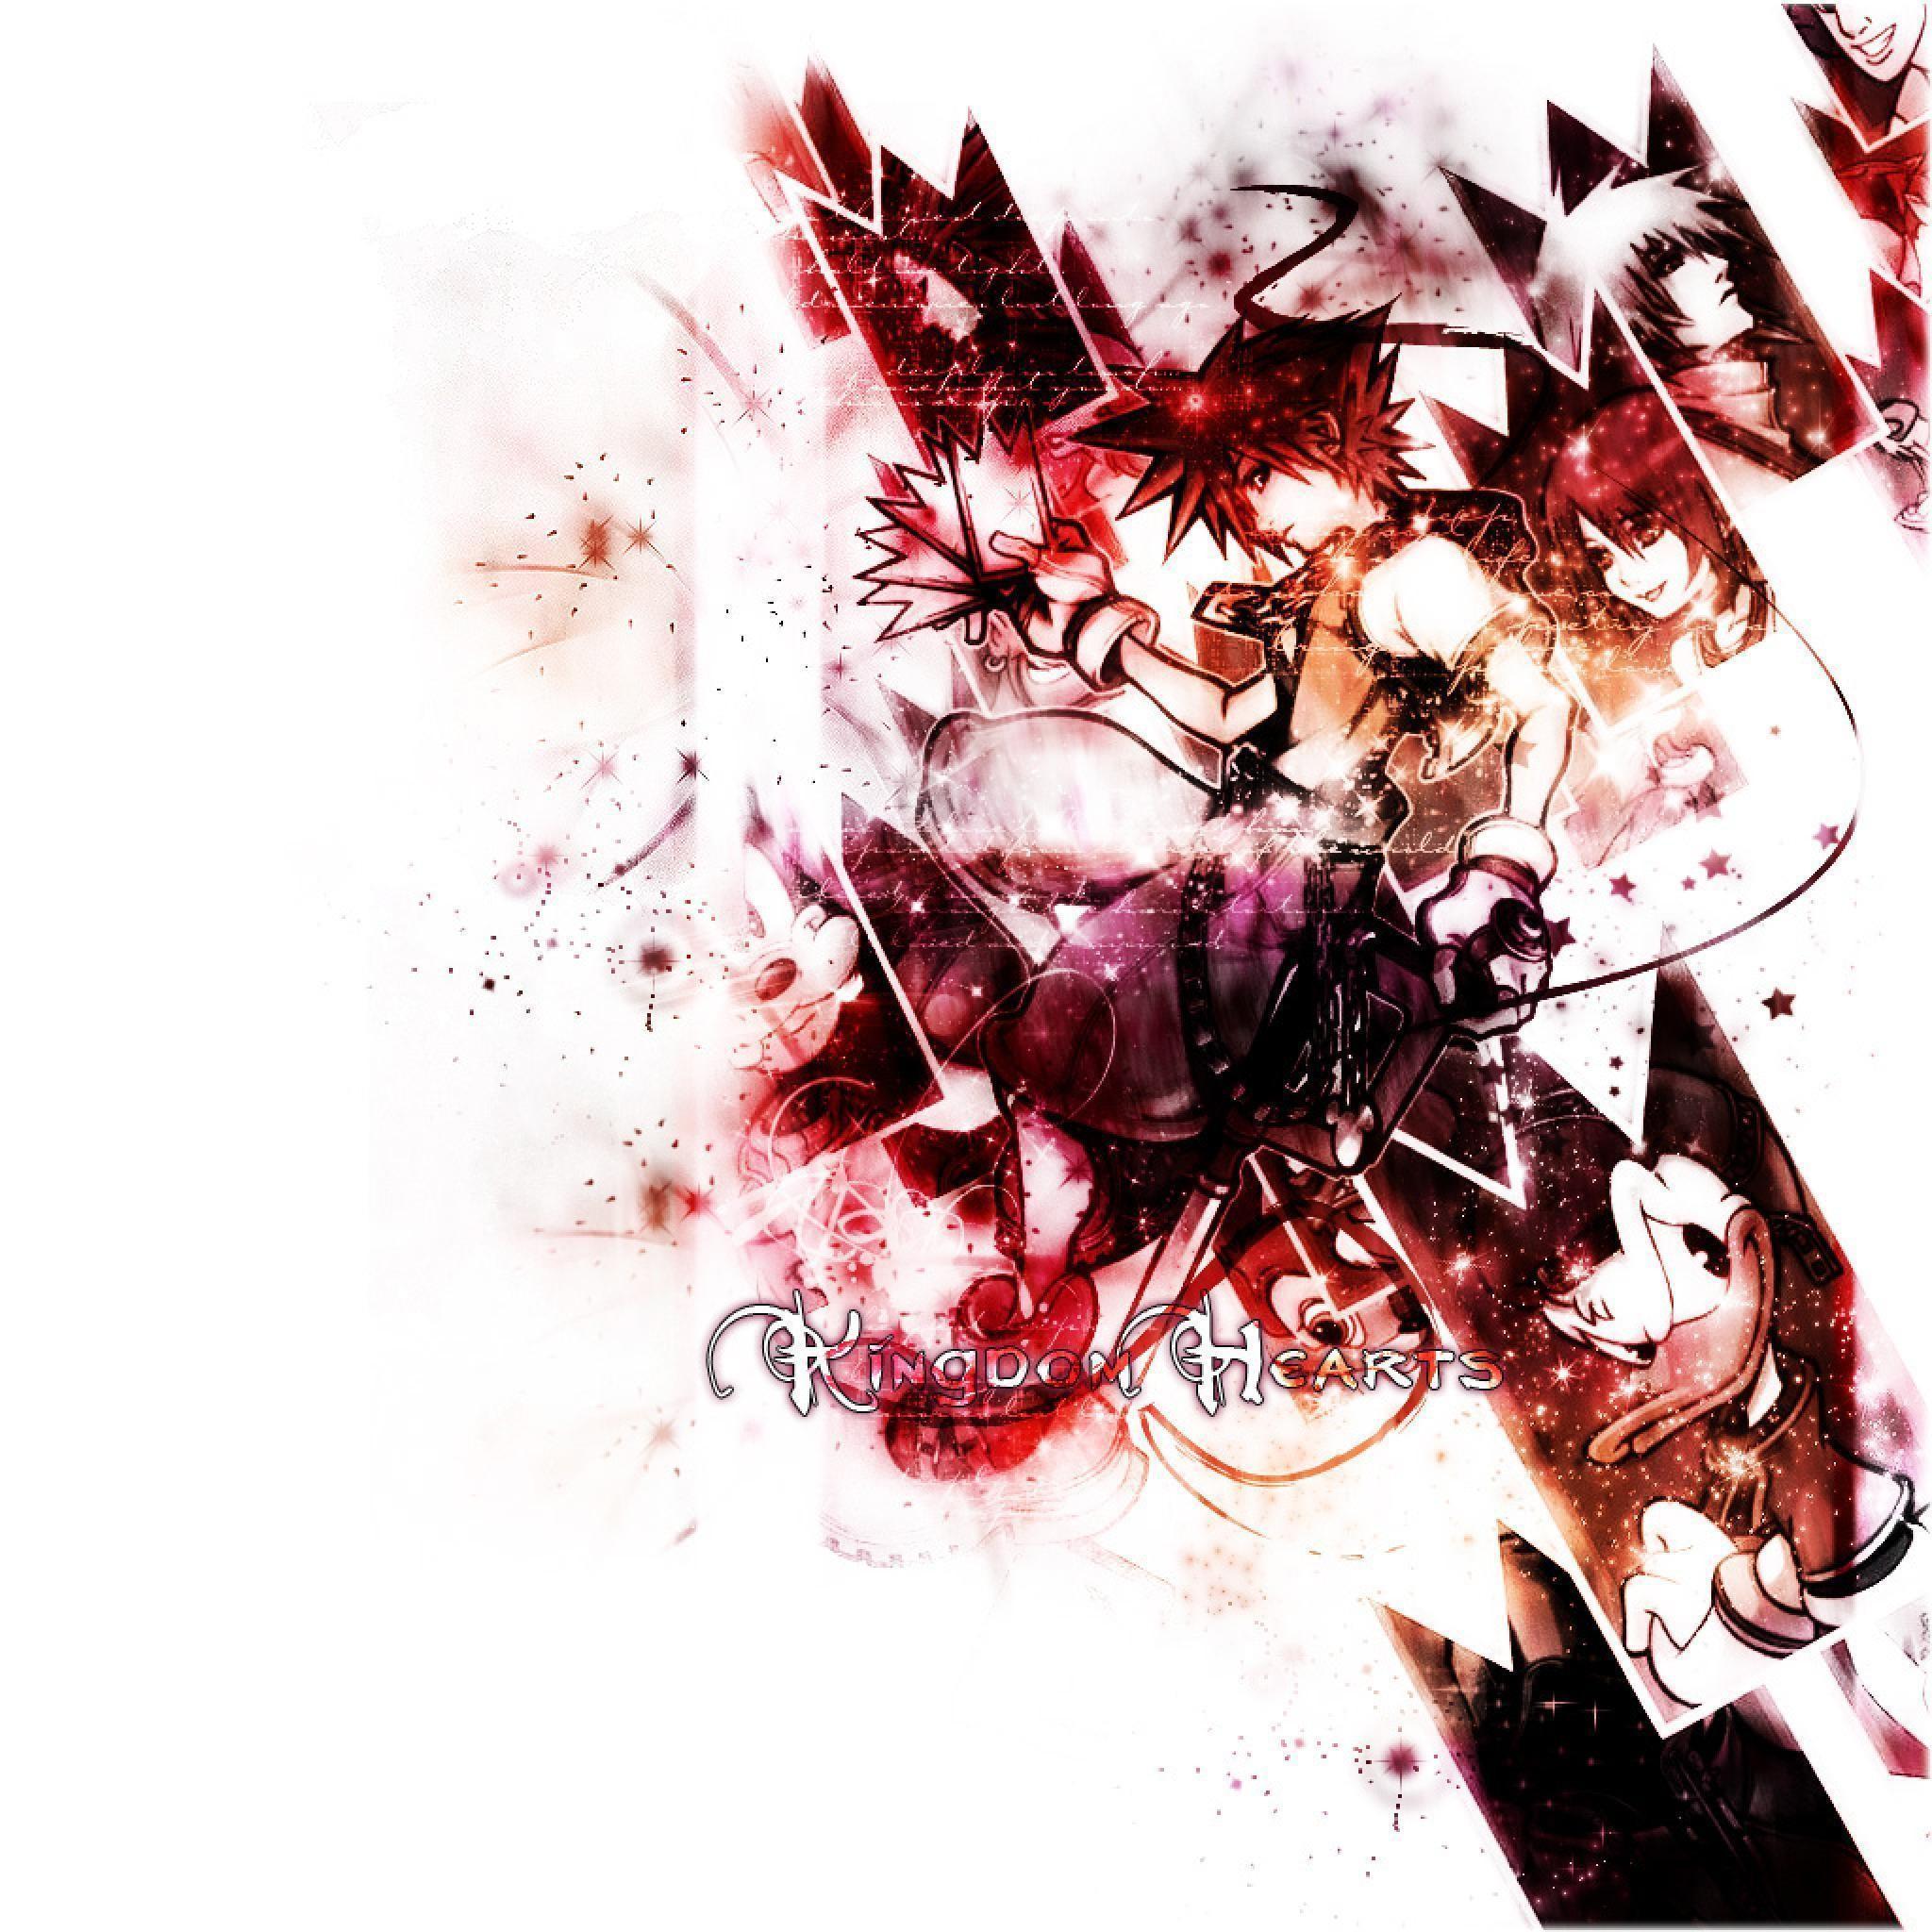 Kingdom Hearts 3 Wallpapers – Wallpaper Cave